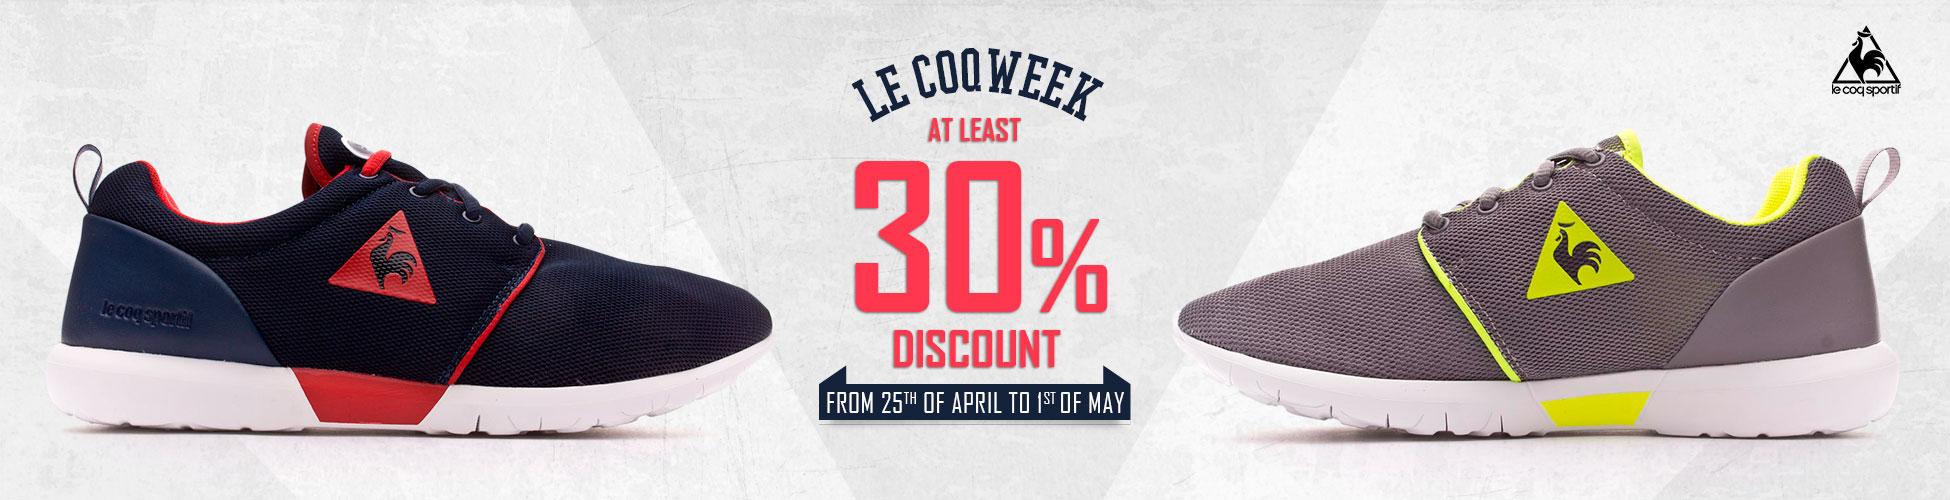 Le Coq Week